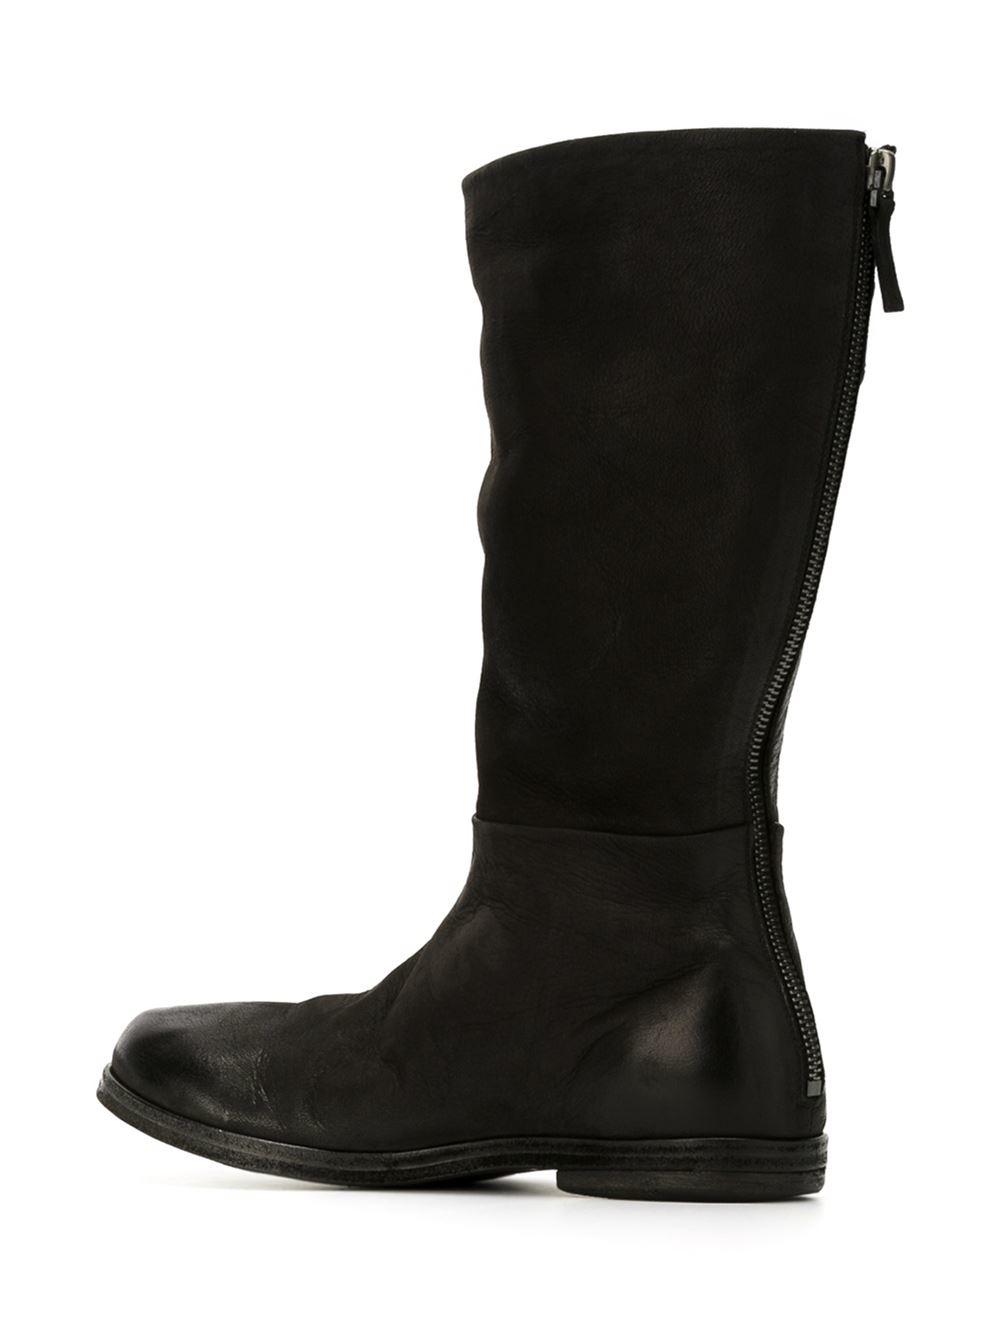 mars 232 ll mid calf length boots in black lyst